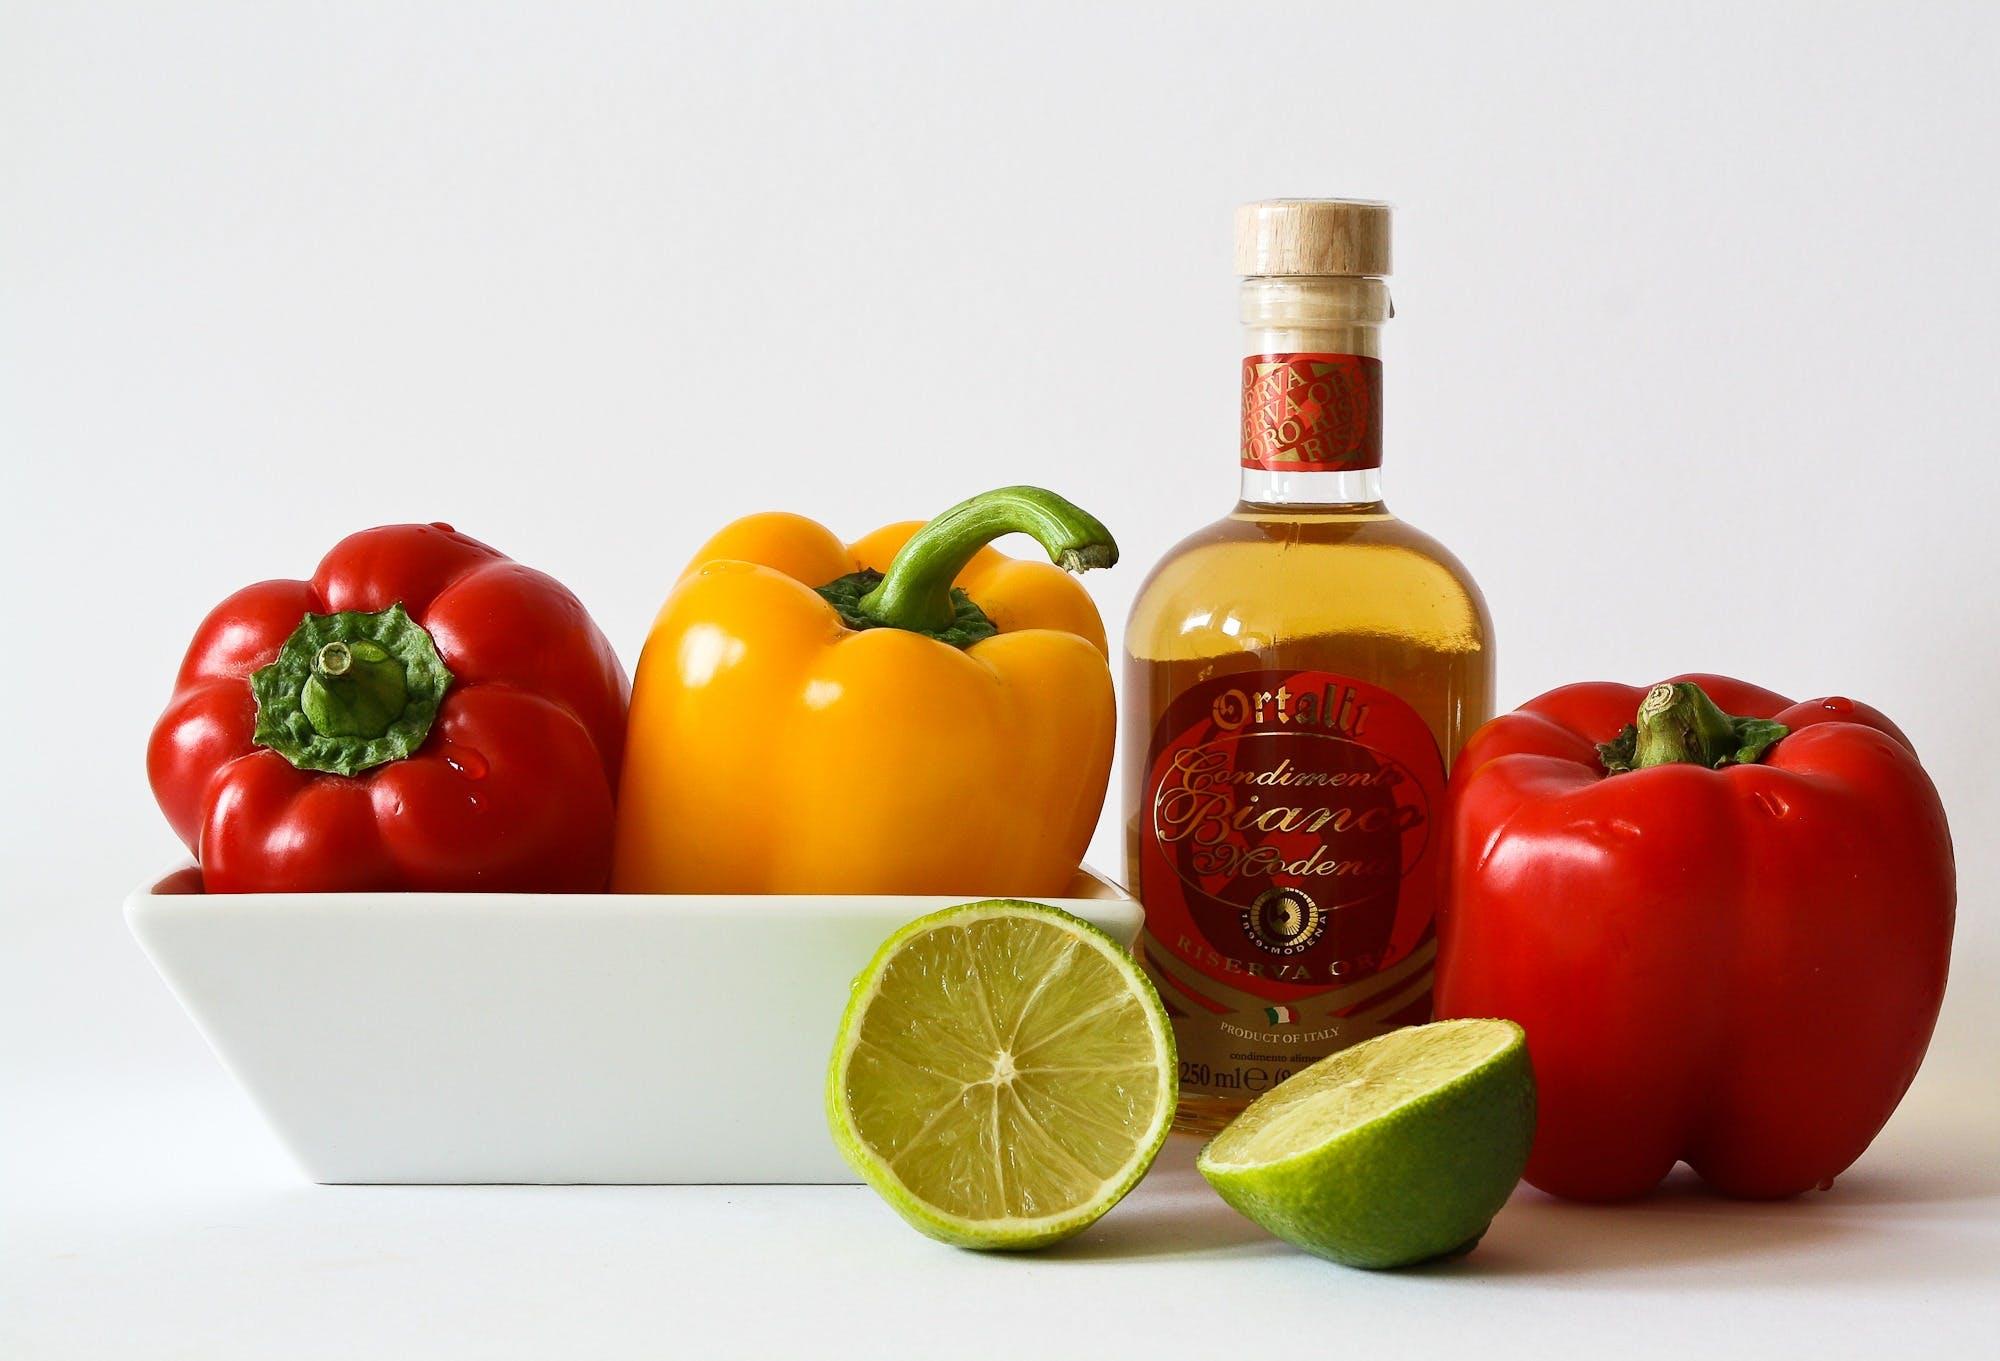 Red and Green Bell Pepper Inside White Ceramic Tray Near to Bottle and Lemon